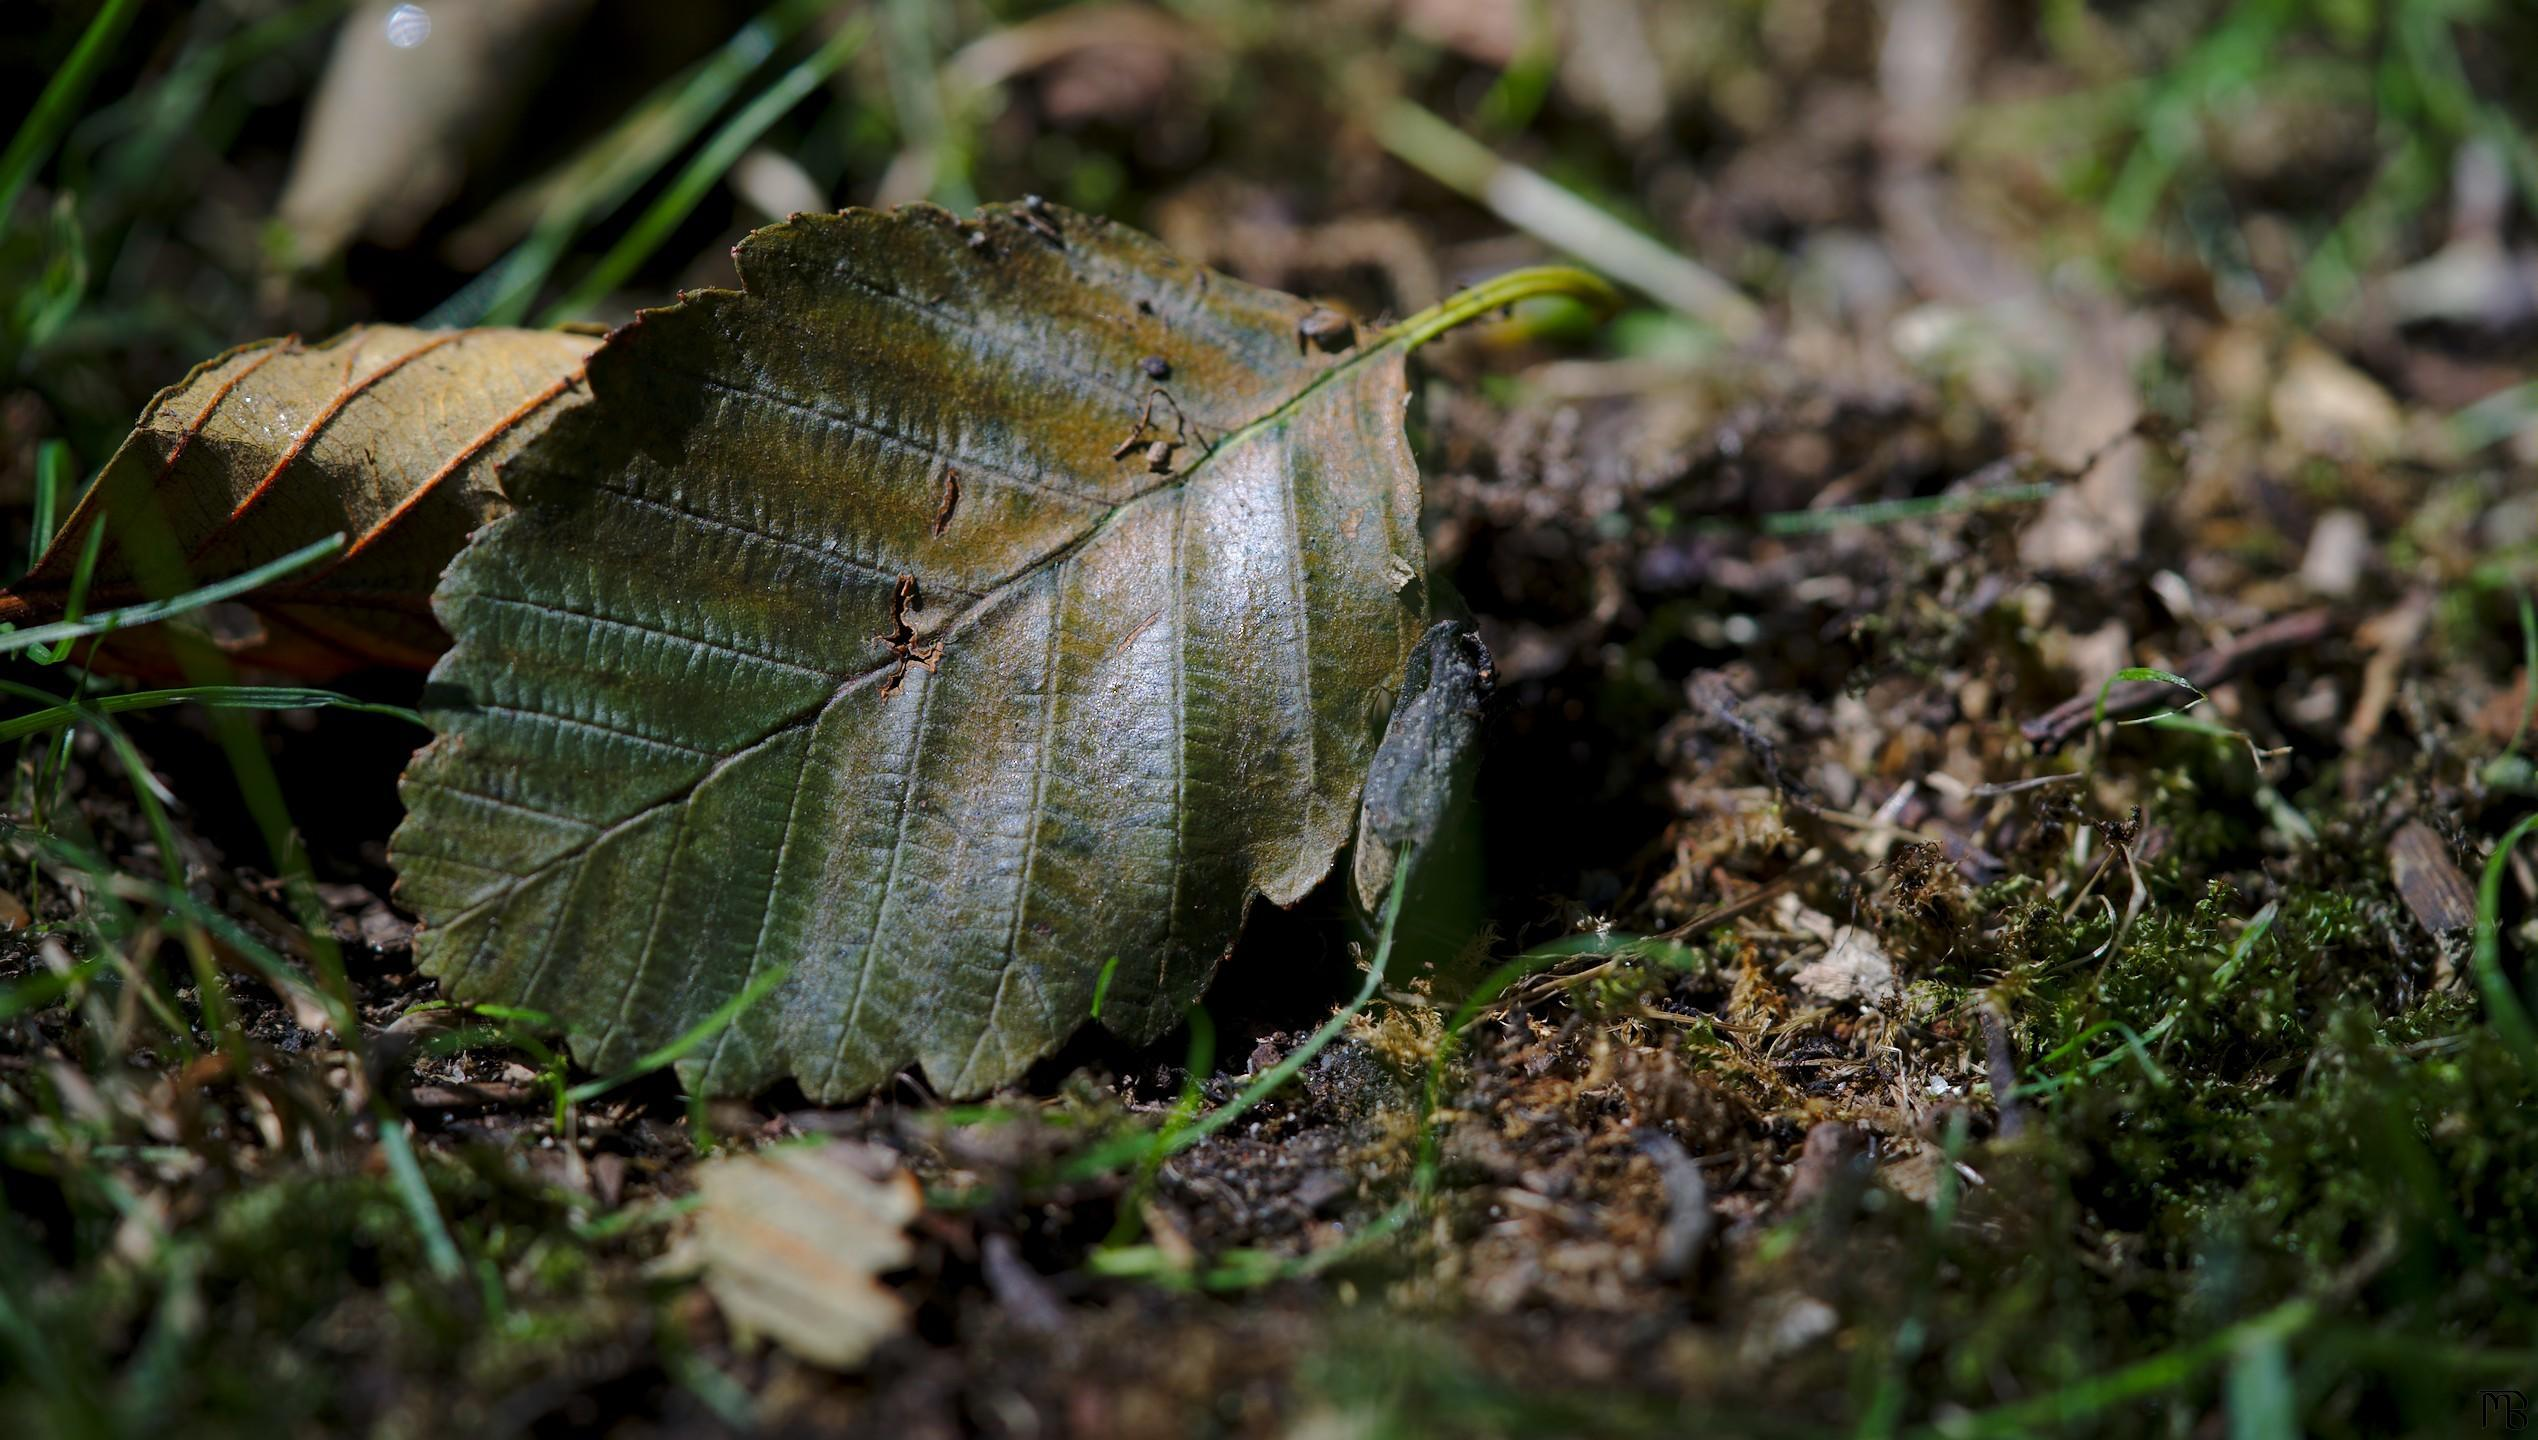 Dying leaf on ground